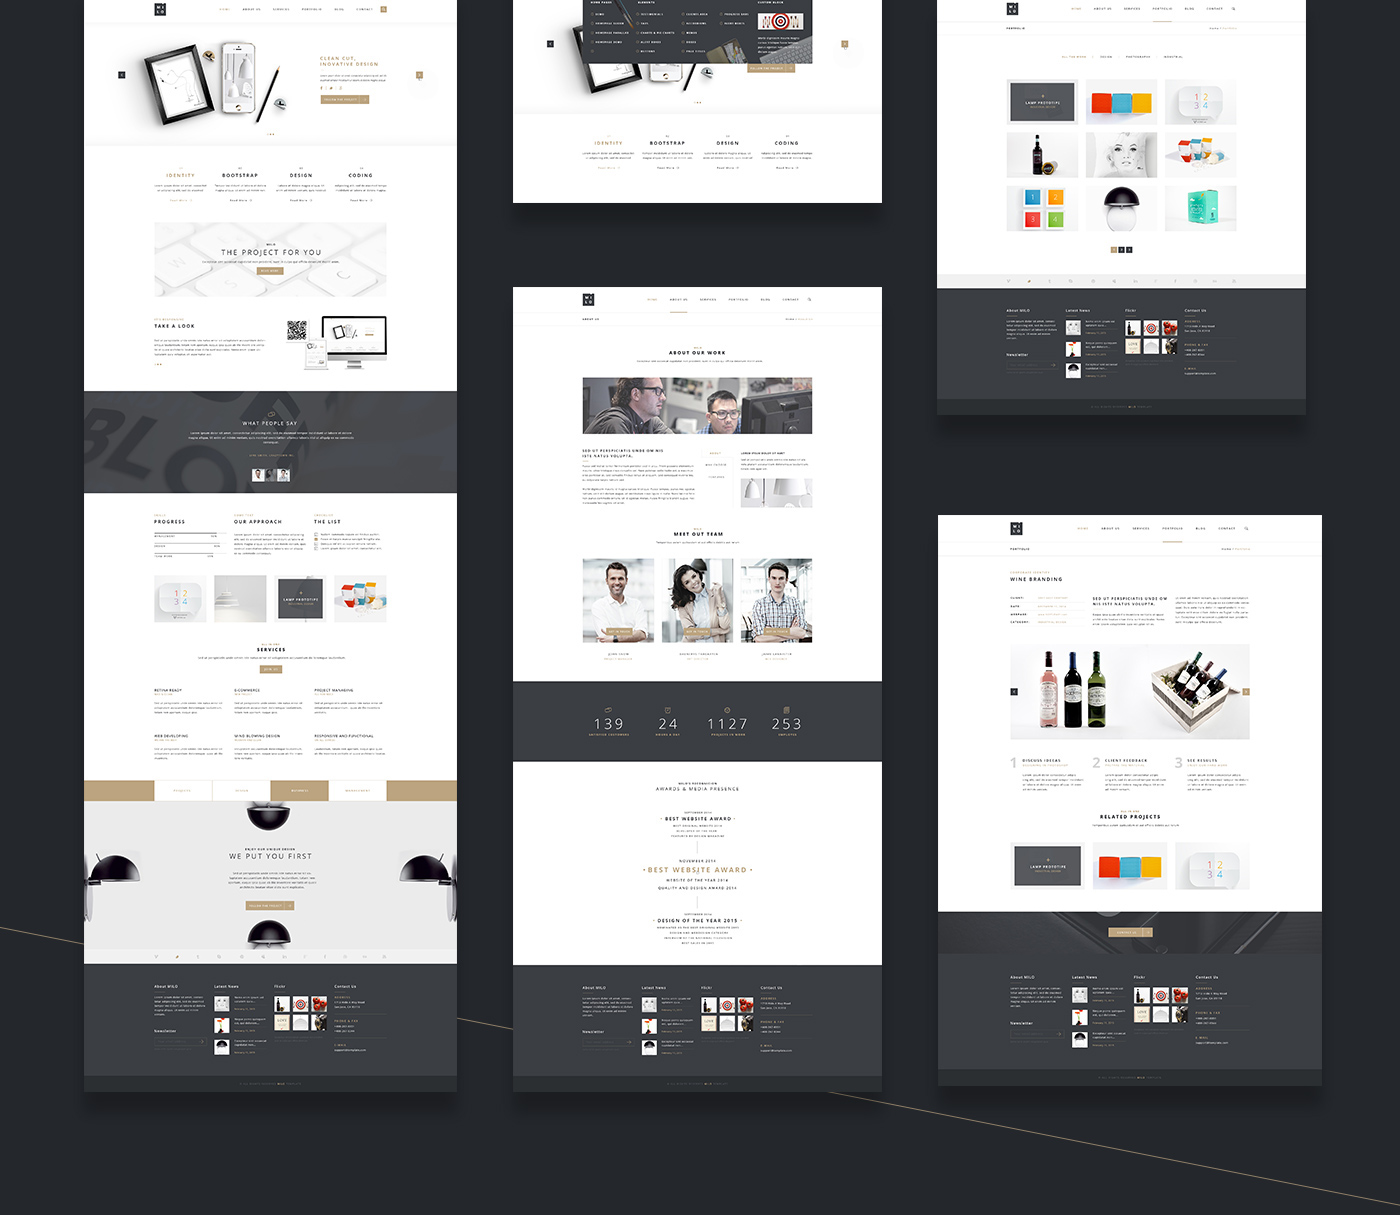 Website html5 css3 bootstrap modern minimal business joomla psd download